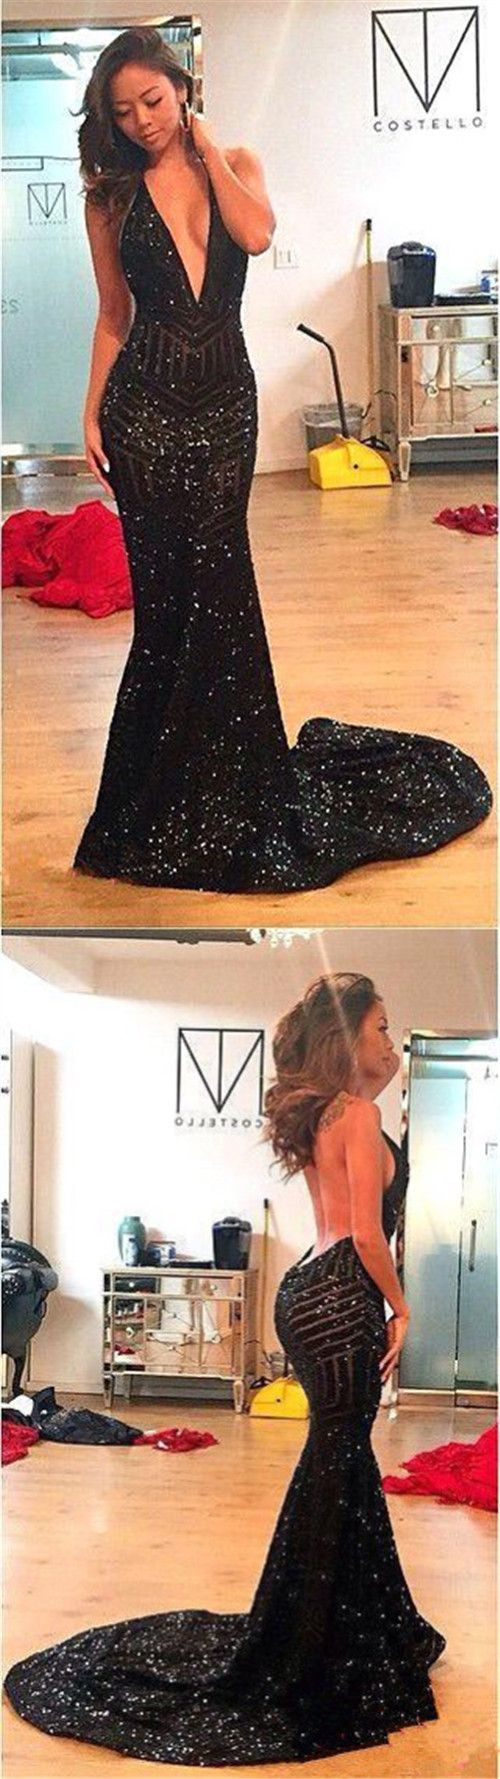 Black sequined prom dressessparkle prom dressessexy prom dresses